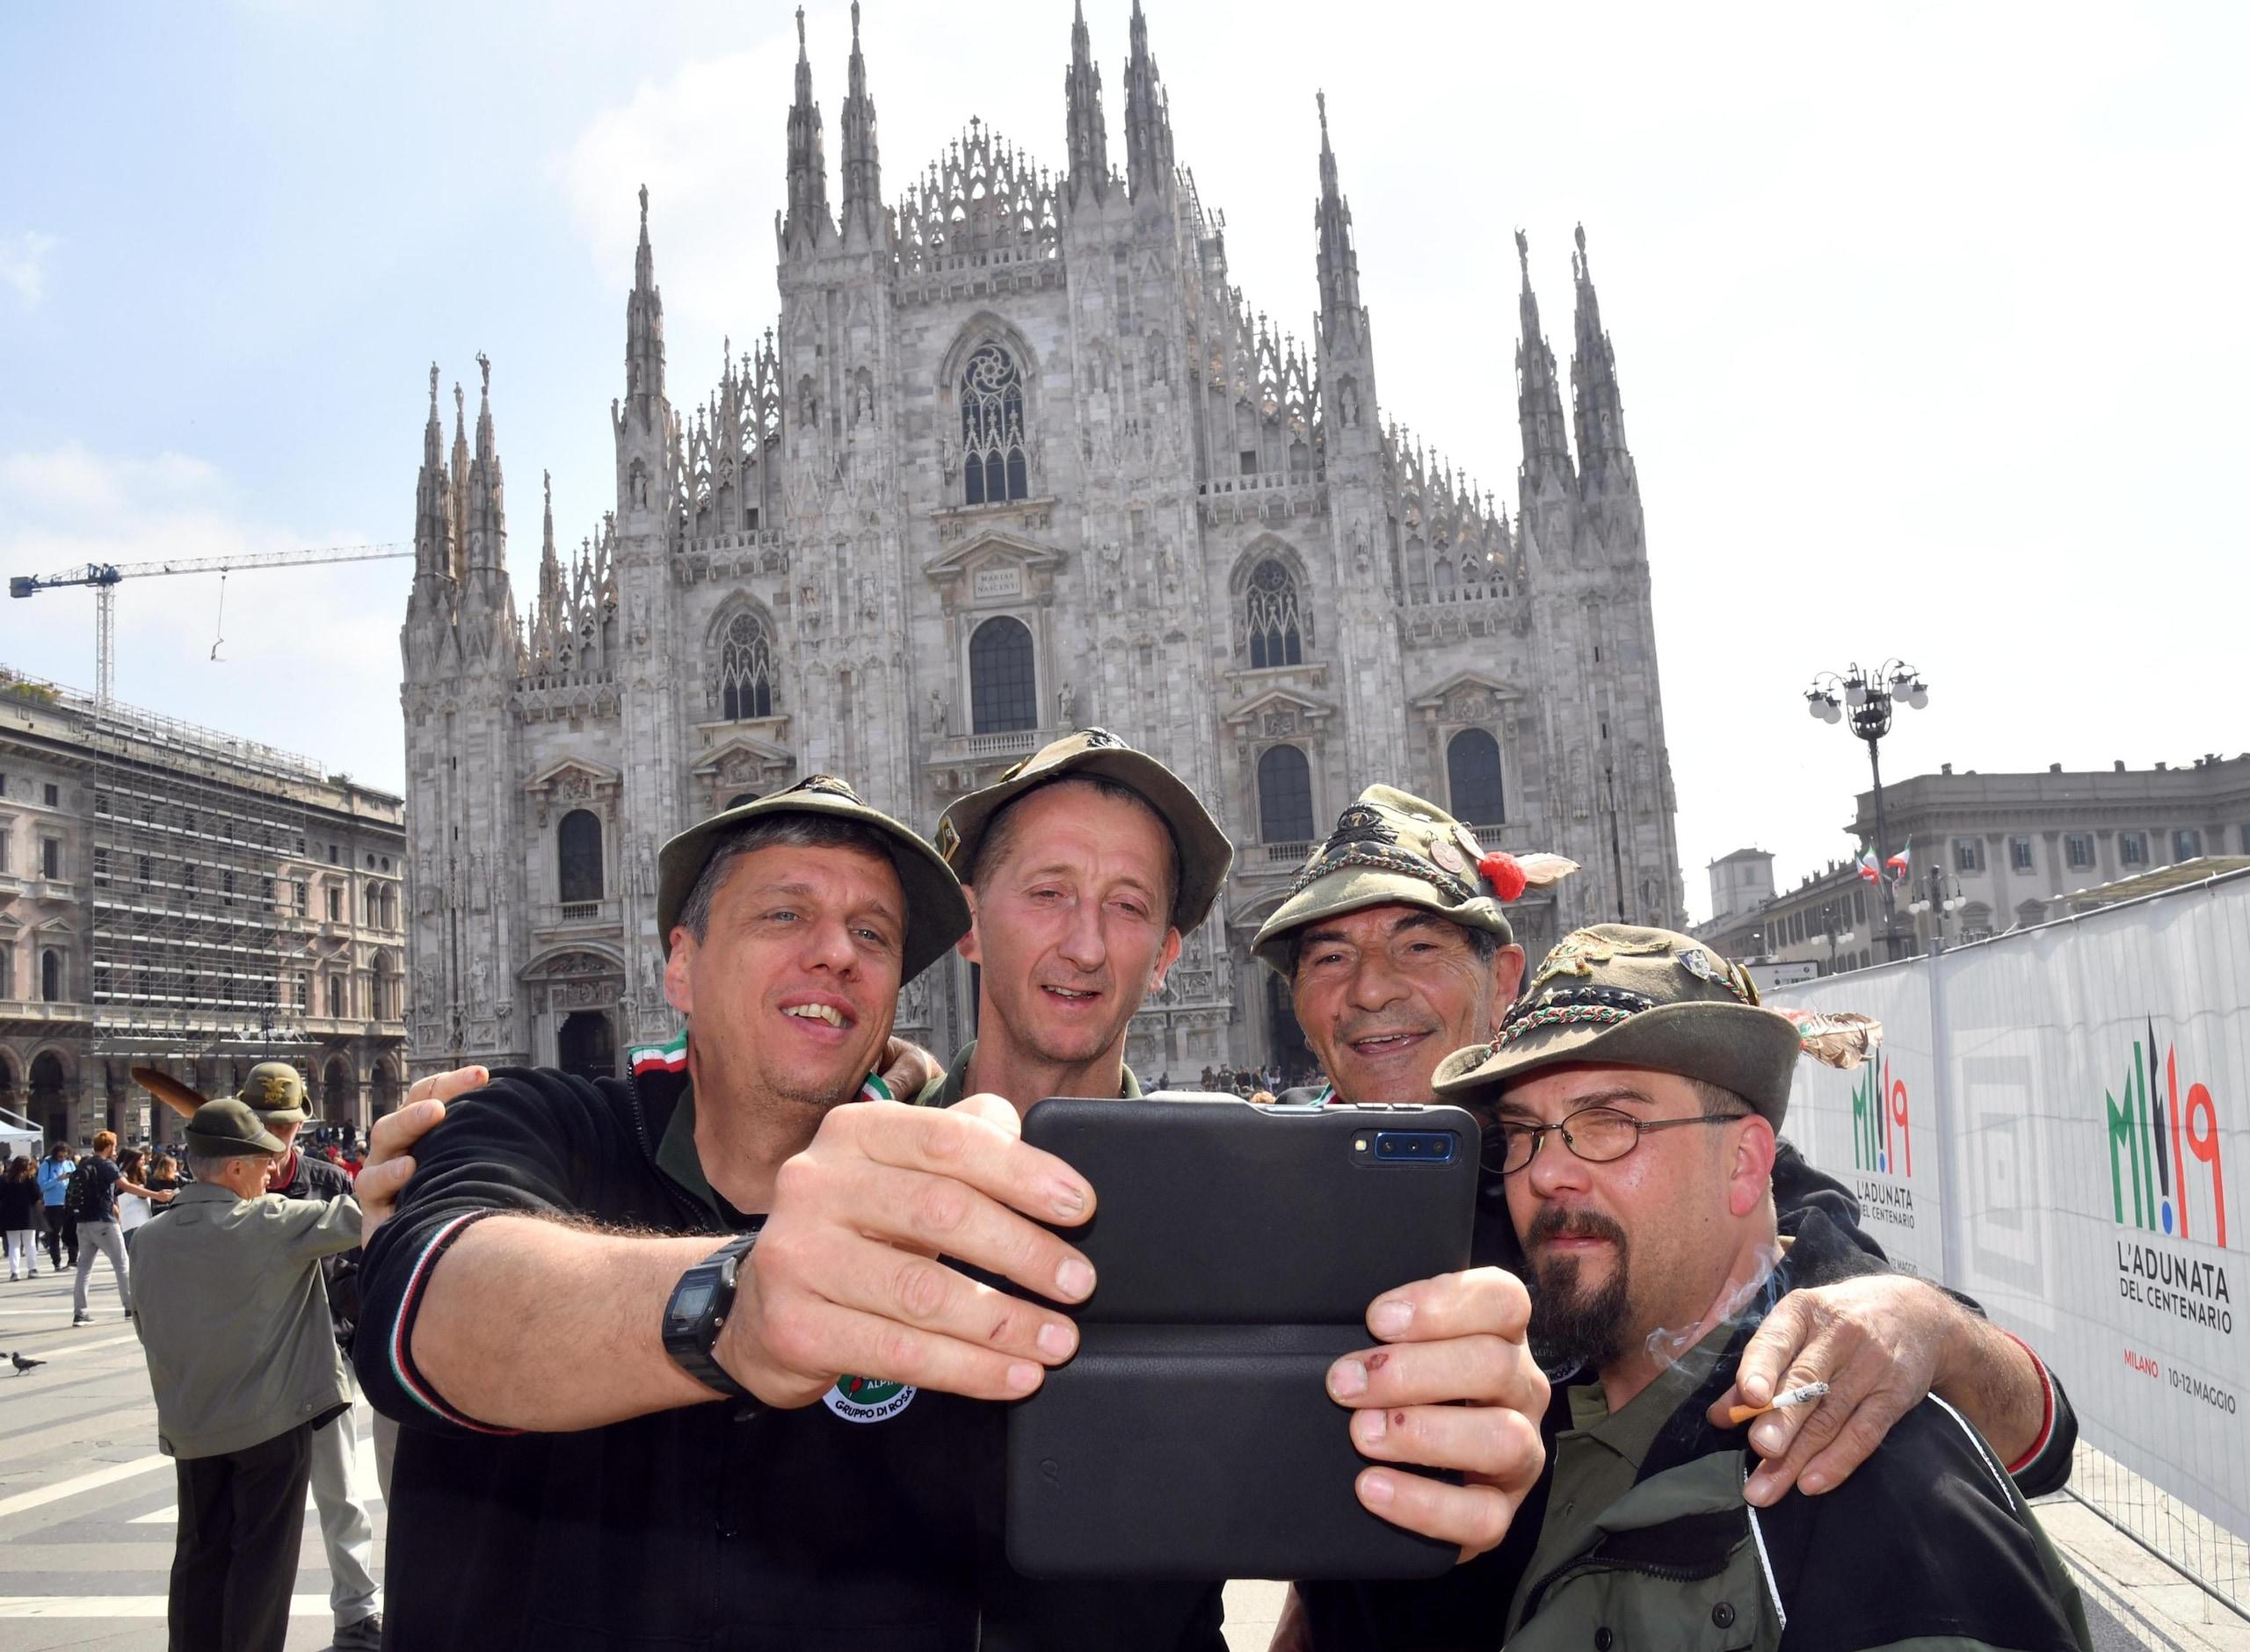 Adunata Alpini, alzabandiera in Duomo